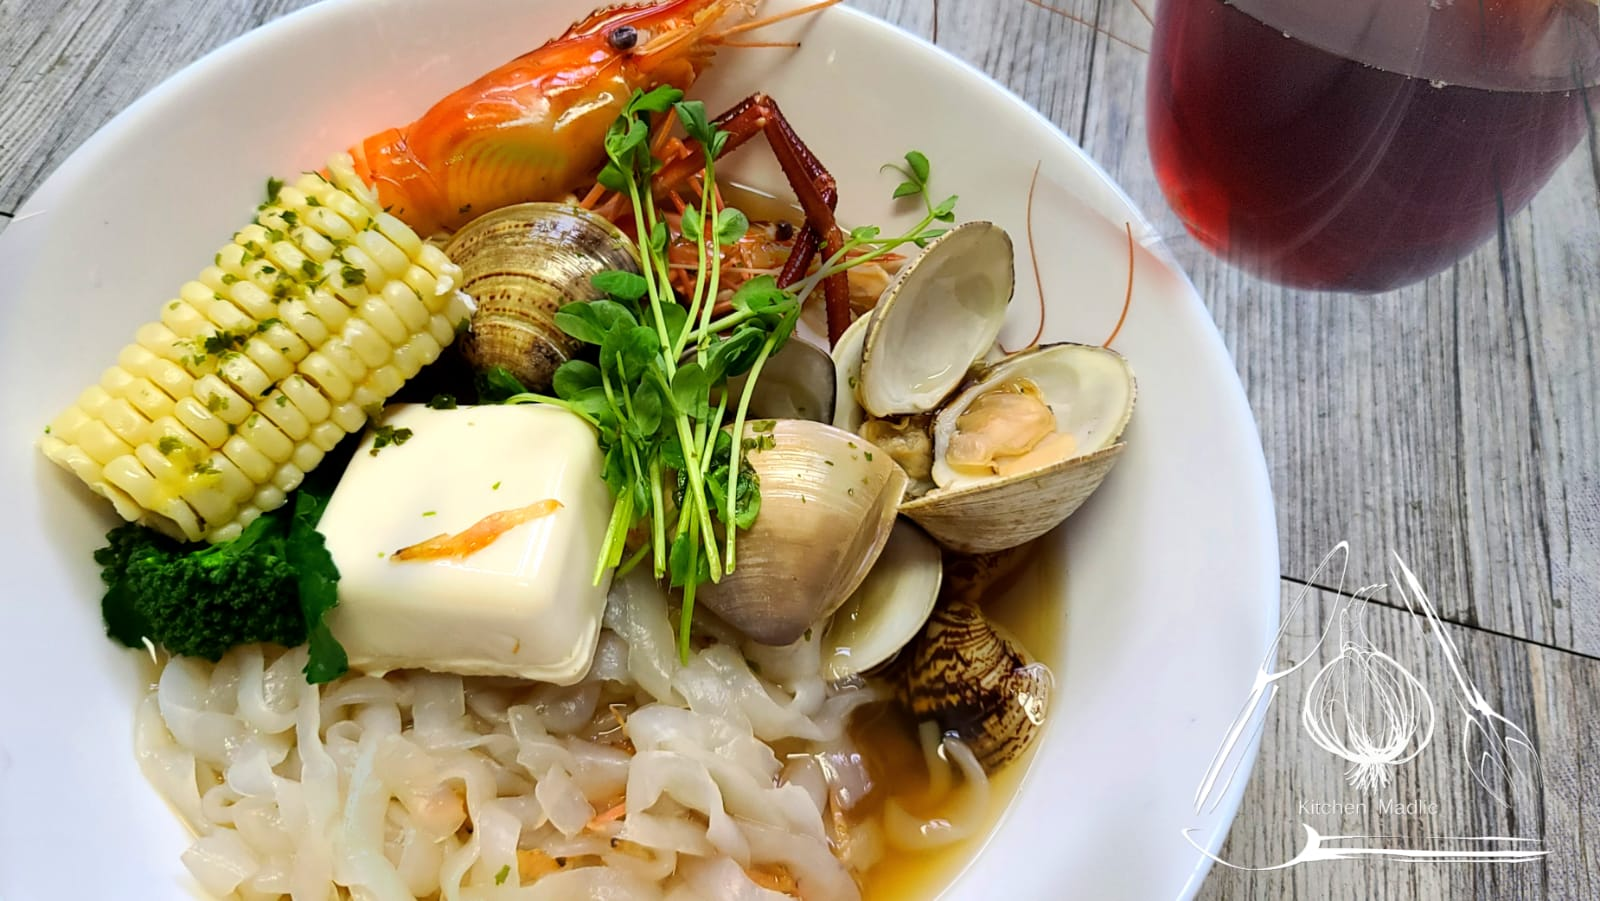 日式昆布湯海鮮蒟蒻寬麵。(Kitchen Madlic提供)